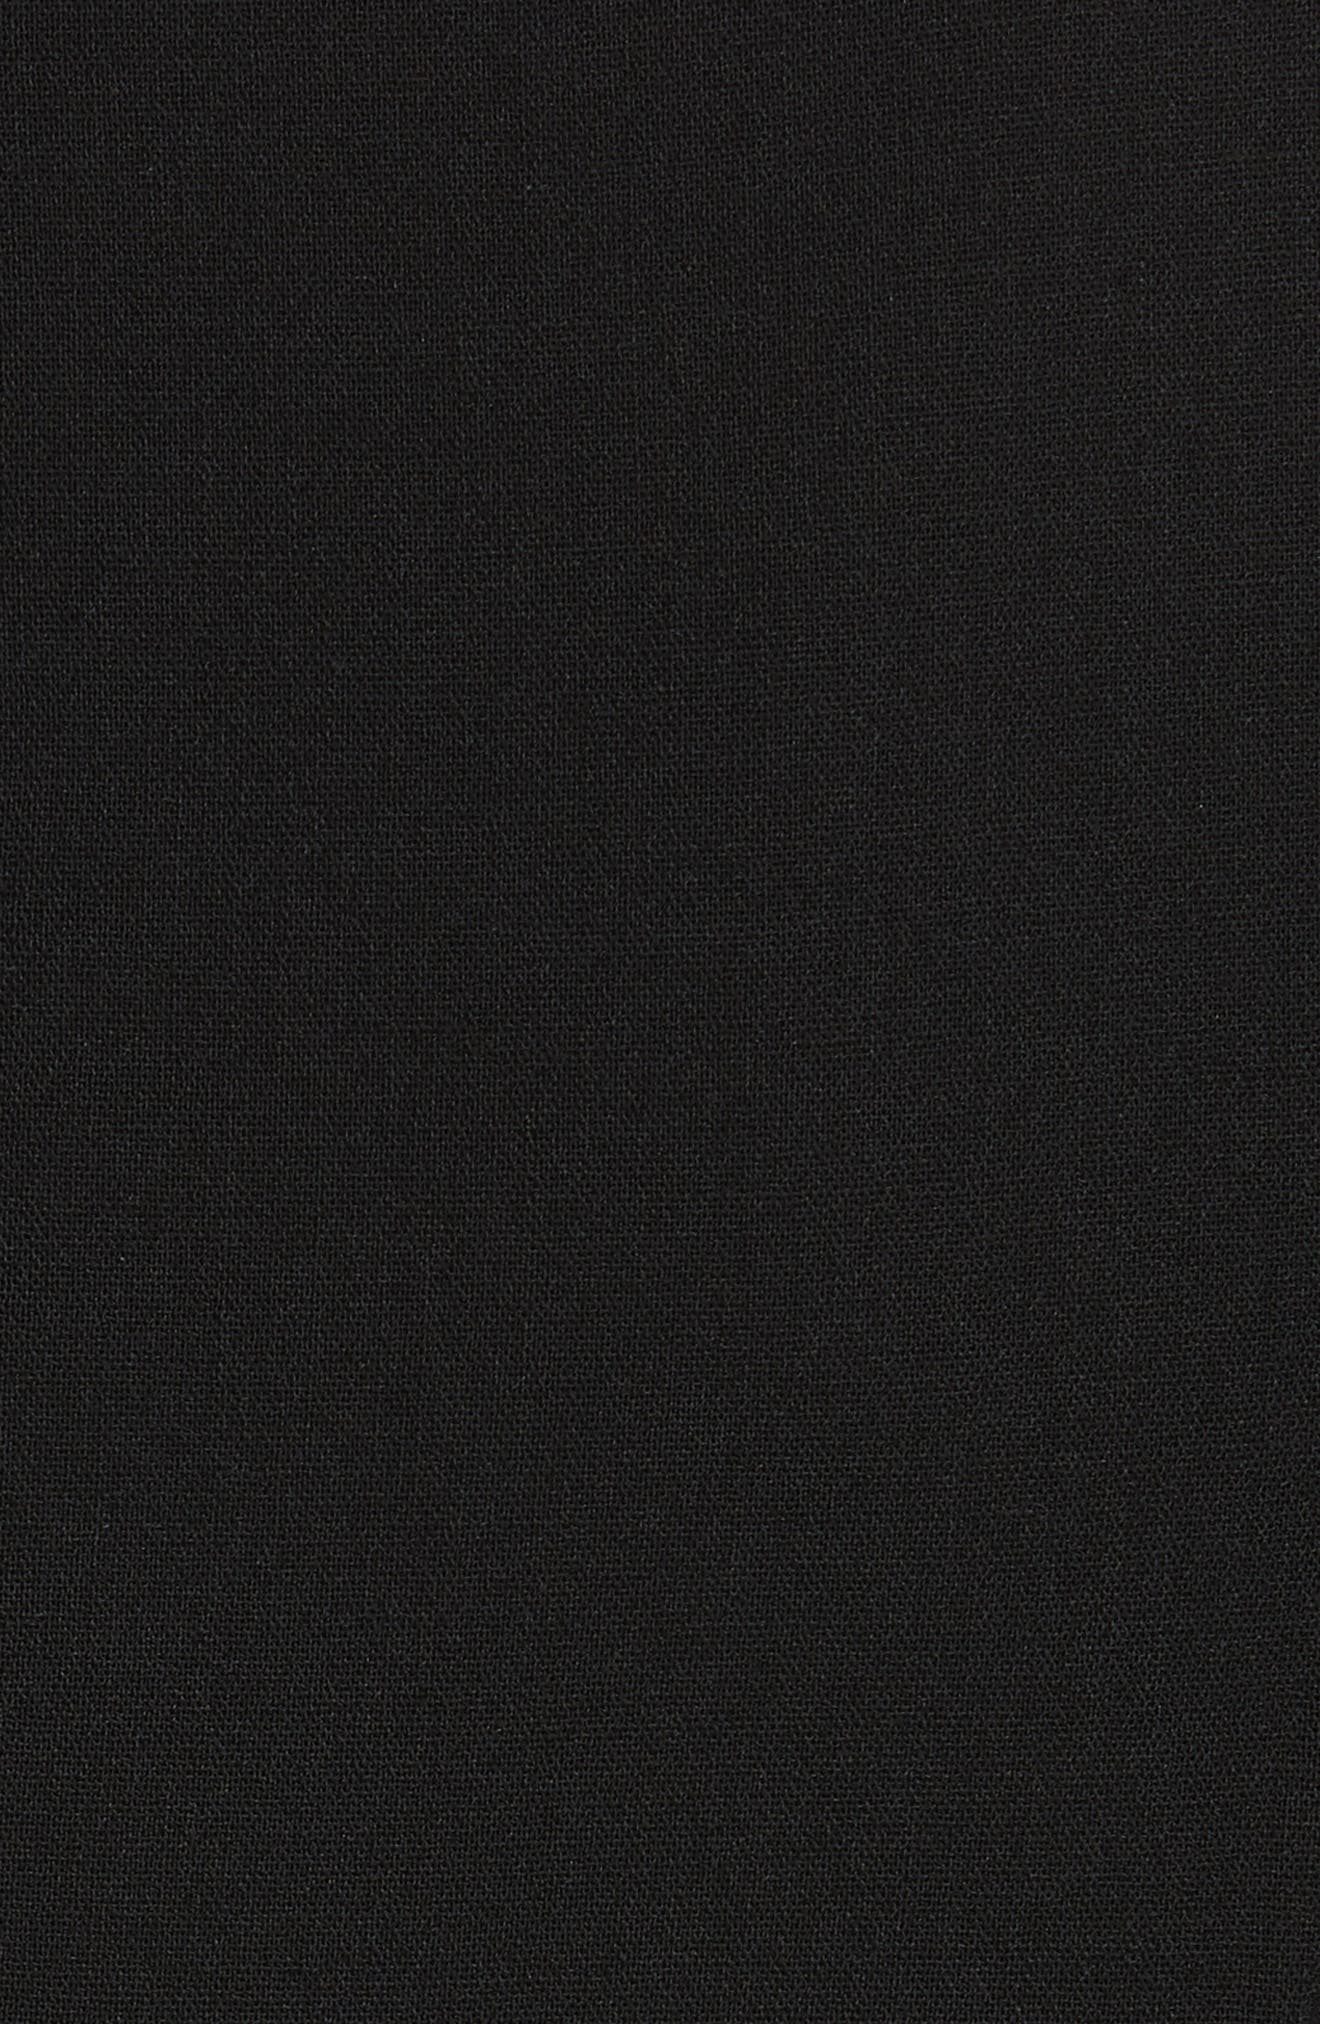 Draped Chiffon Sleeve Dress,                             Alternate thumbnail 5, color,                             001